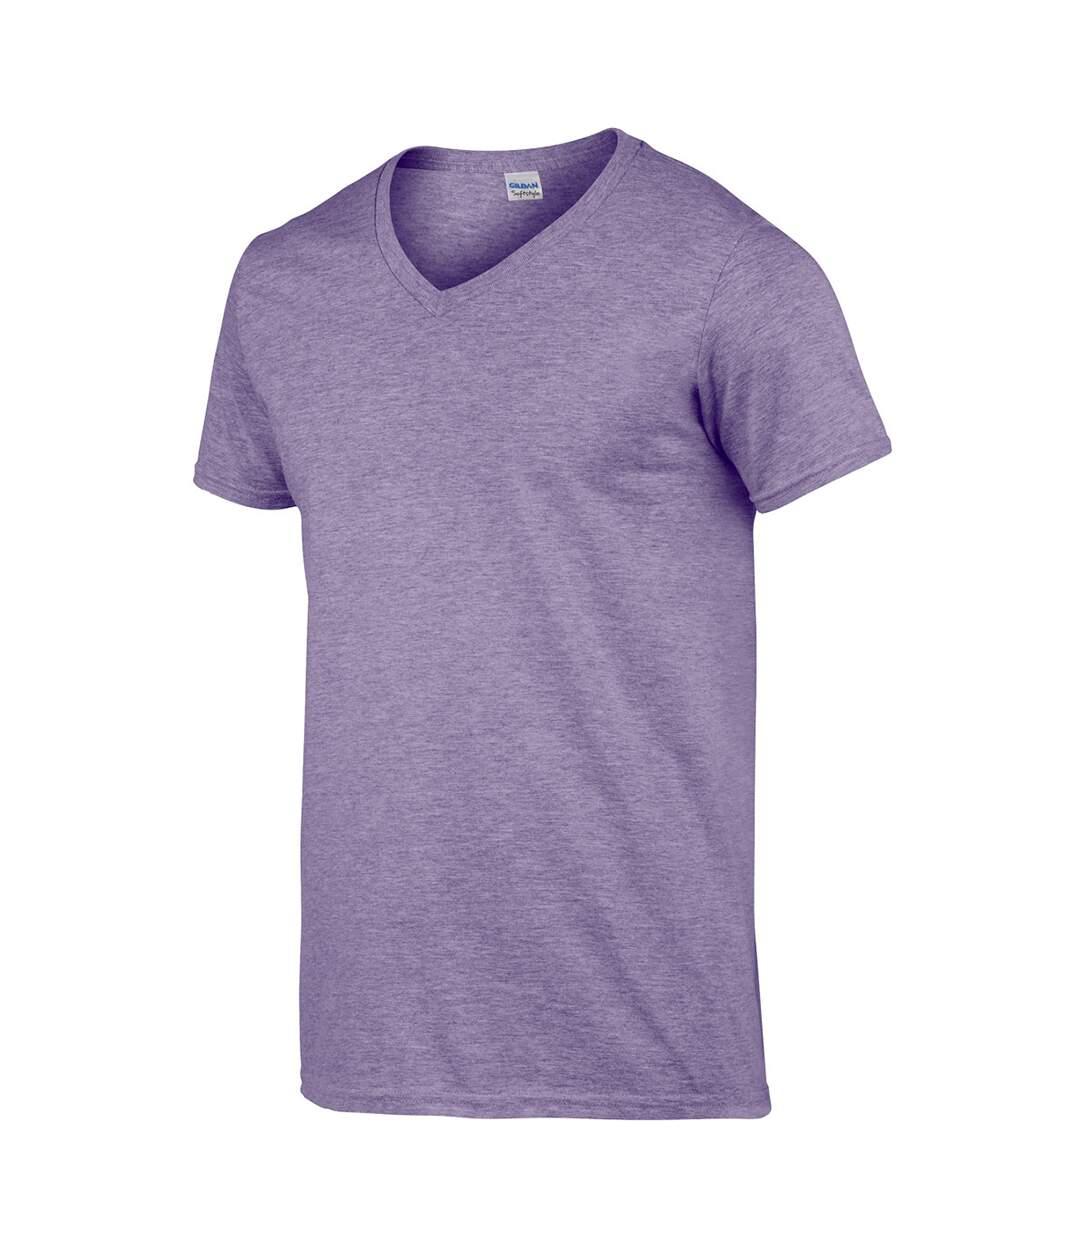 Gildan Mens Soft Style V-Neck Short Sleeve T-Shirt (Heather Purple) - UTBC490